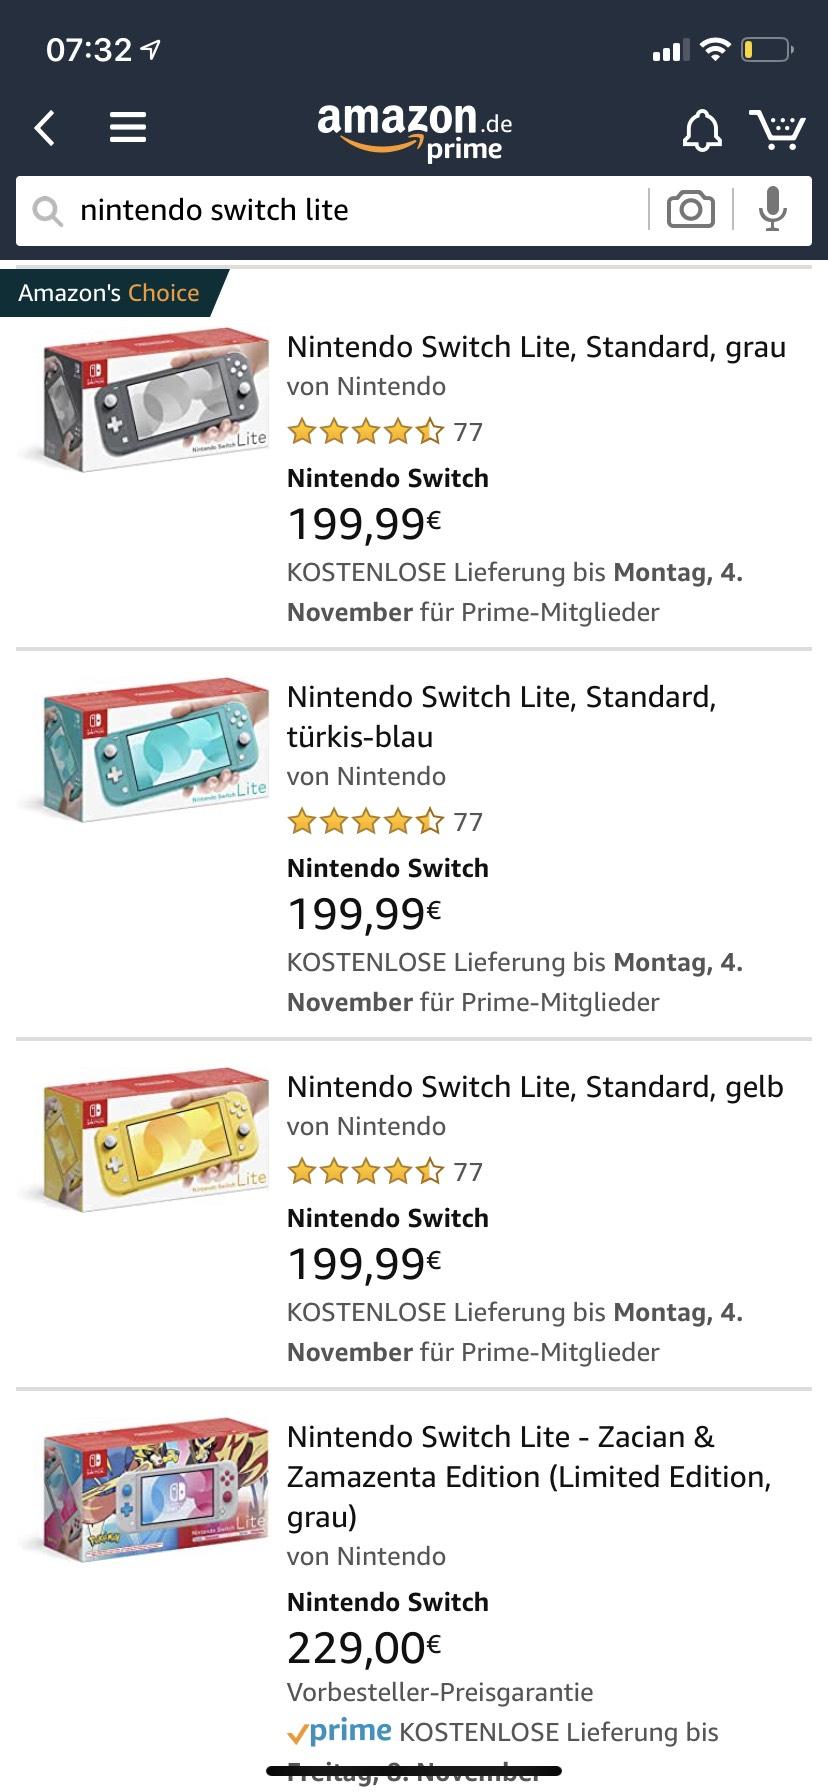 [Amazon] Nintendo Switch Lite in 3 Farben